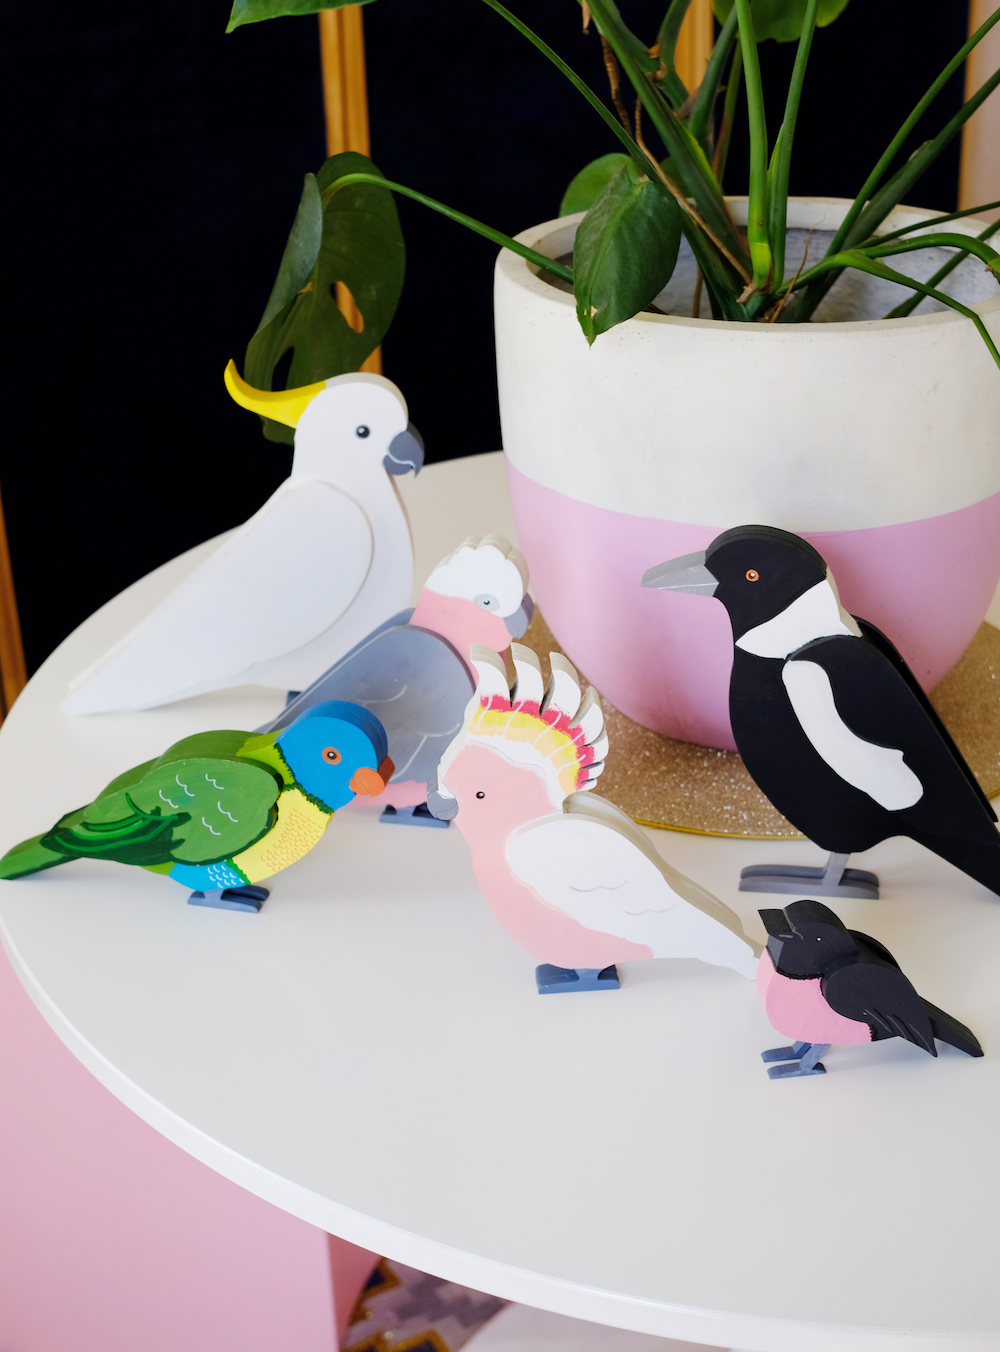 birdsculptures_meganmckean.jpg